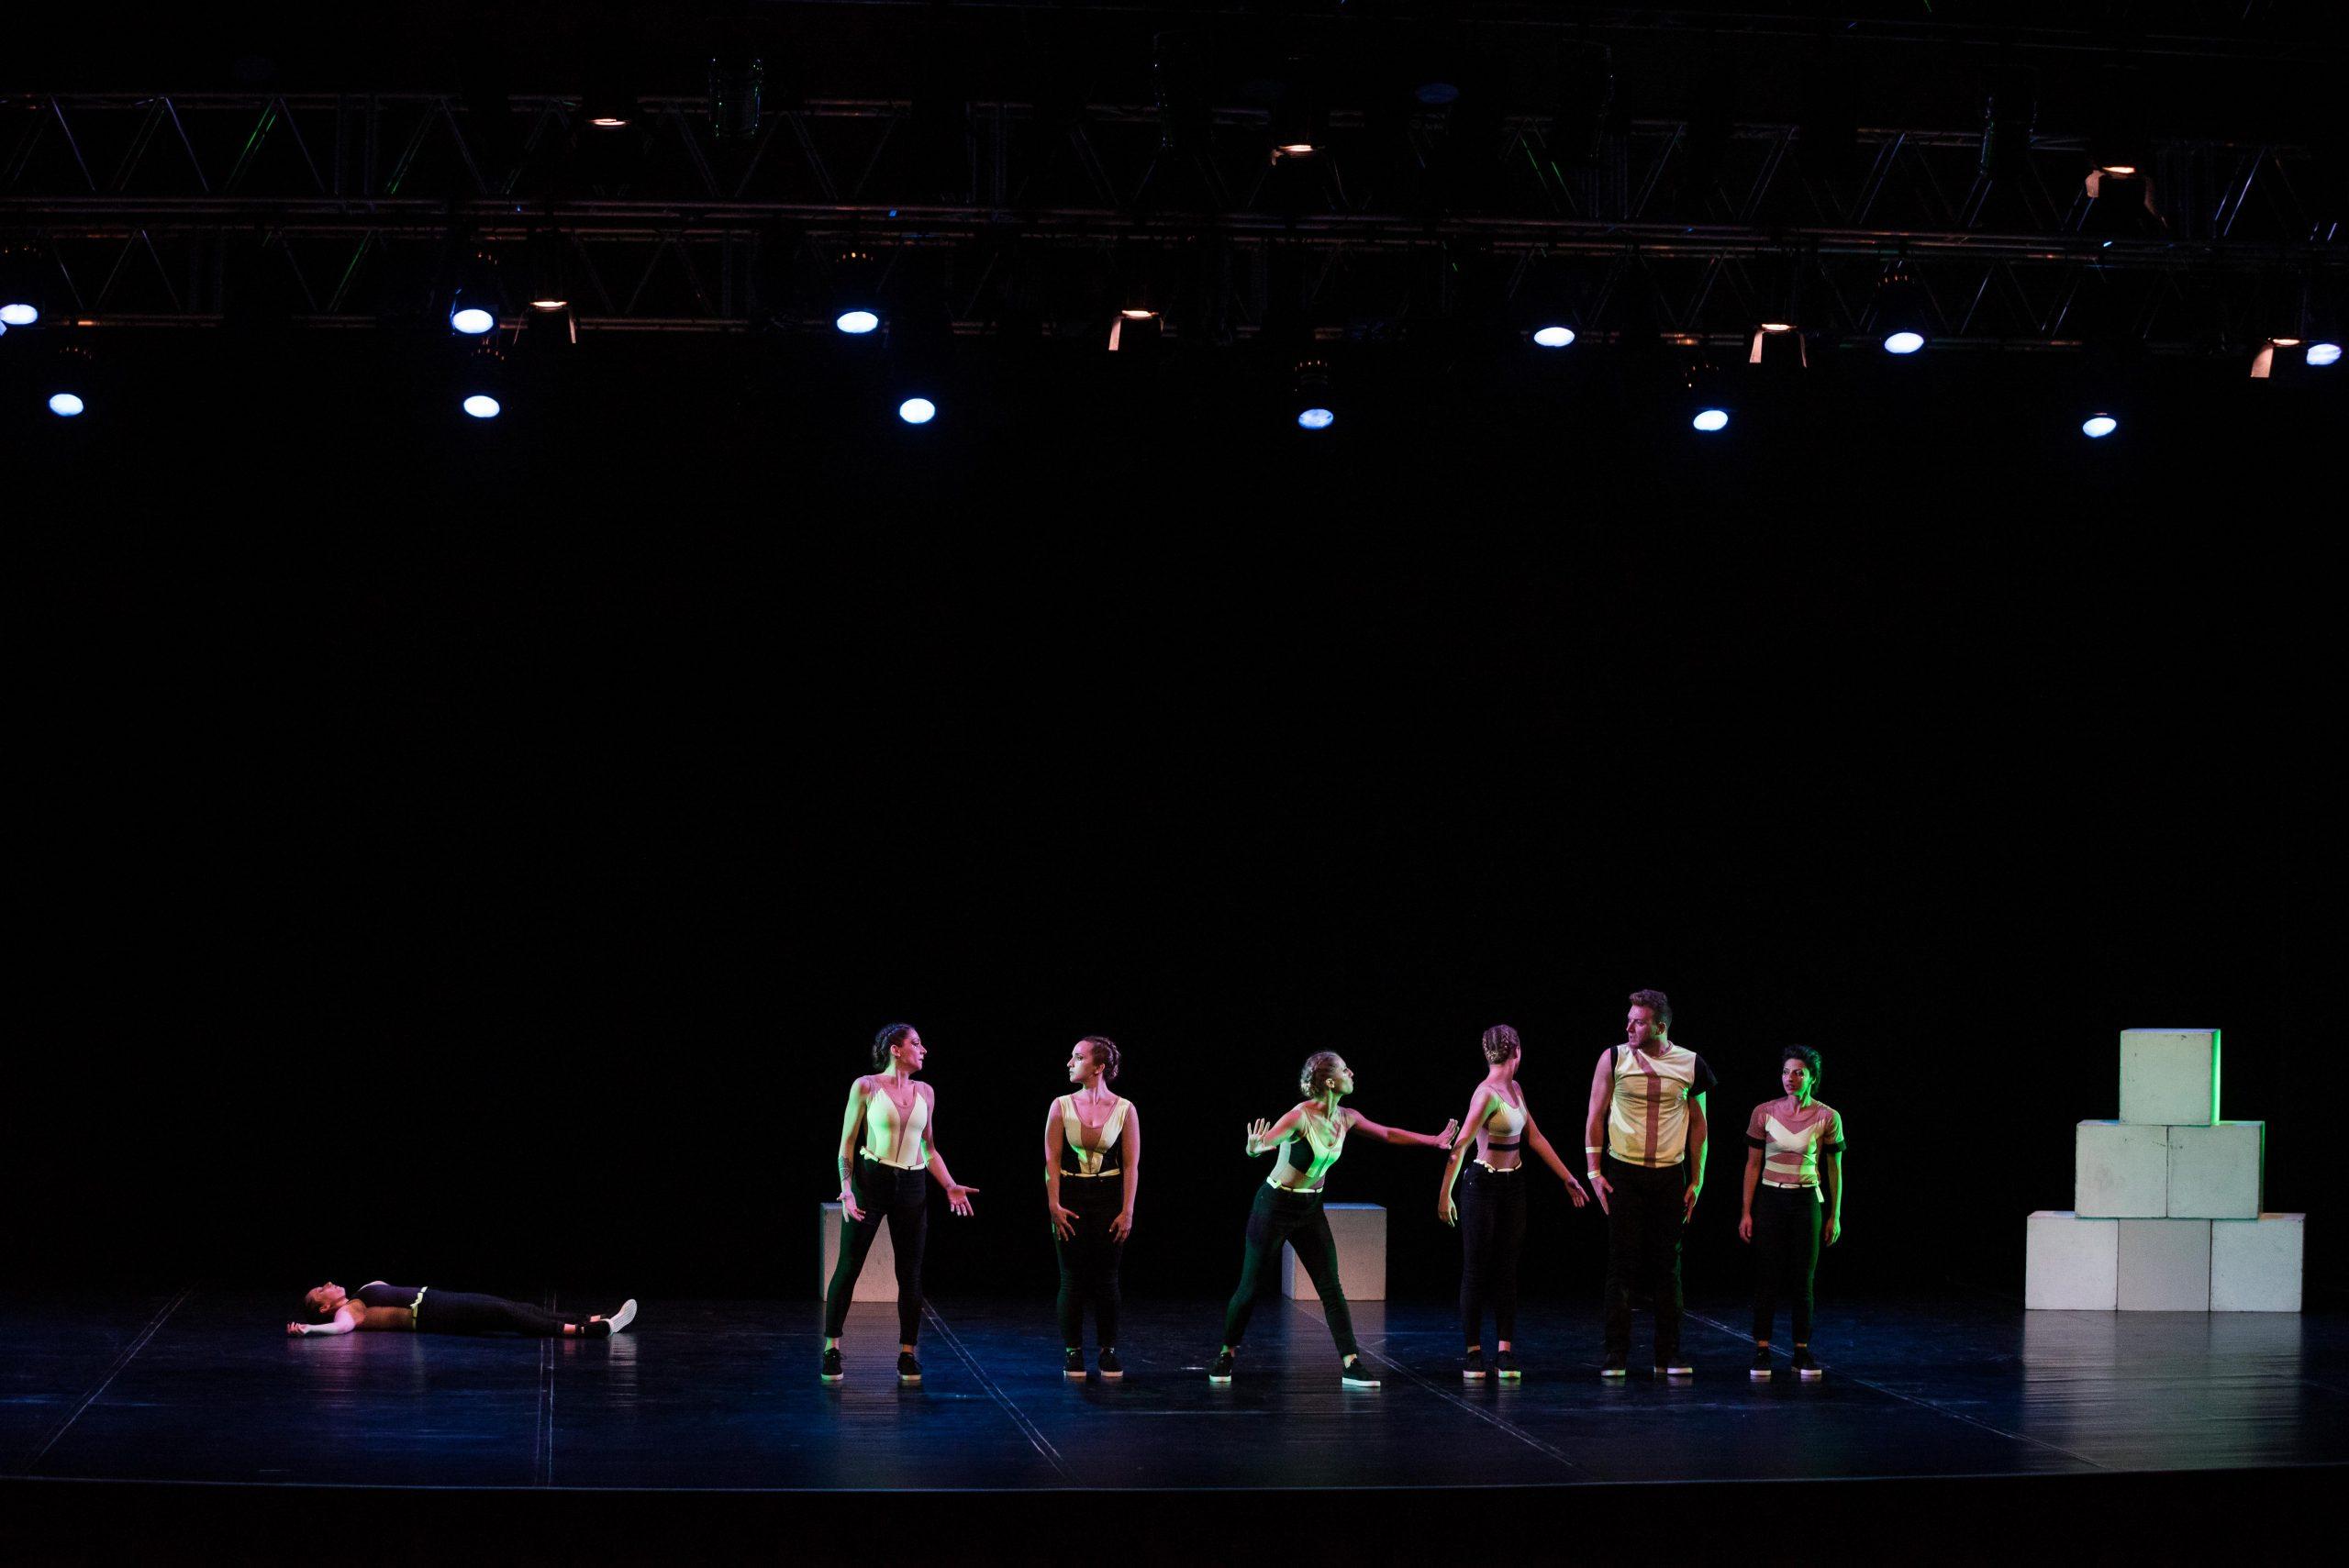 Mystes Dance Company - Racconti - Florence Dance Festival 2